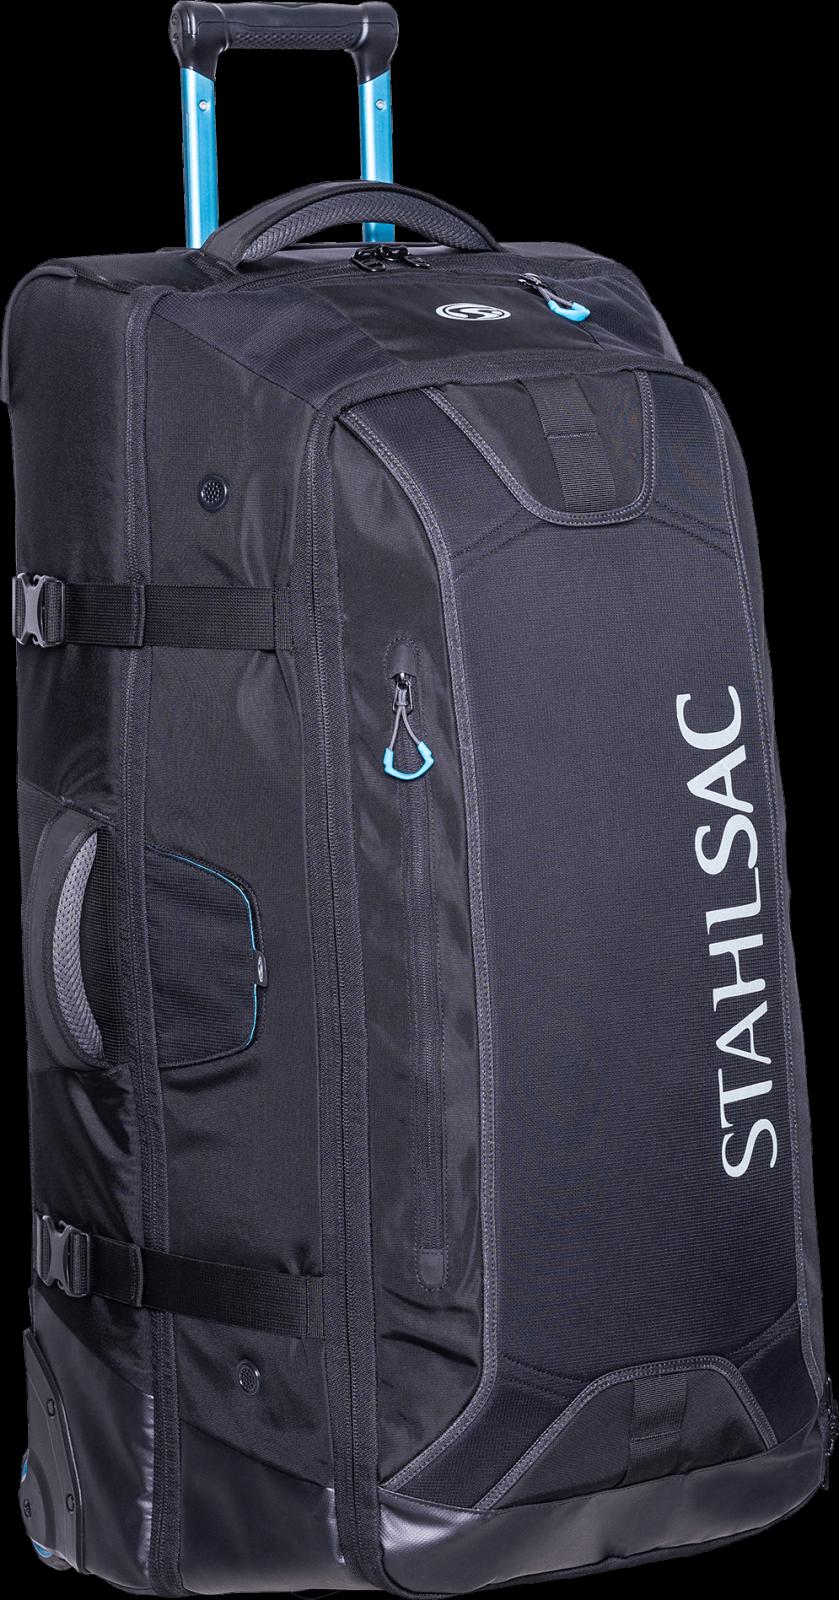 STAHLSAC Steel Wheeled Bag - 34